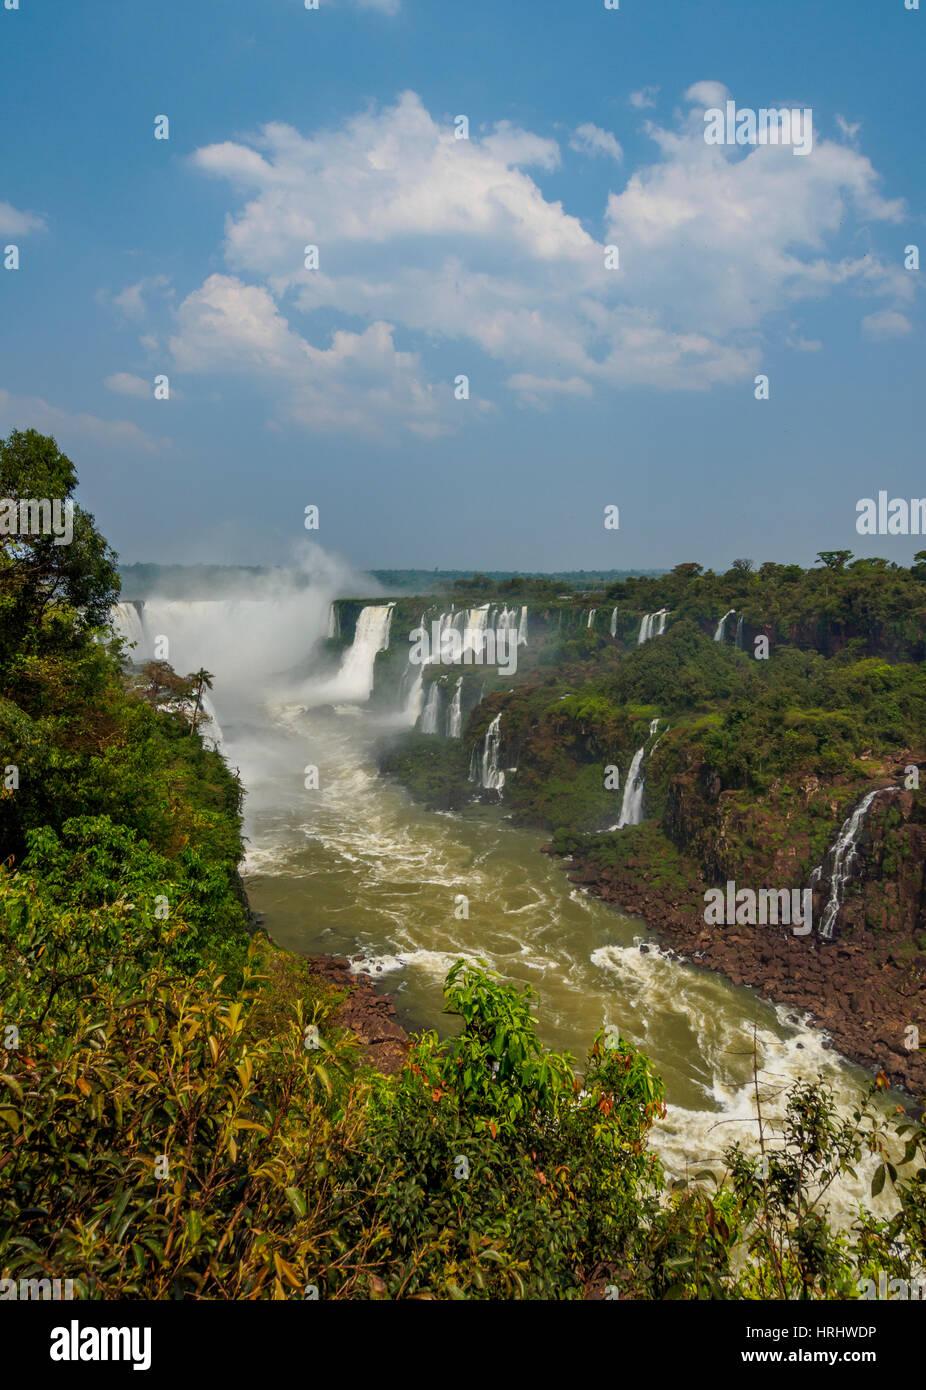 View of the Devil's Throat, part of the Iguazu Falls, UNESCO, Foz do Iguacu, State of Parana, Brazil - Stock Image